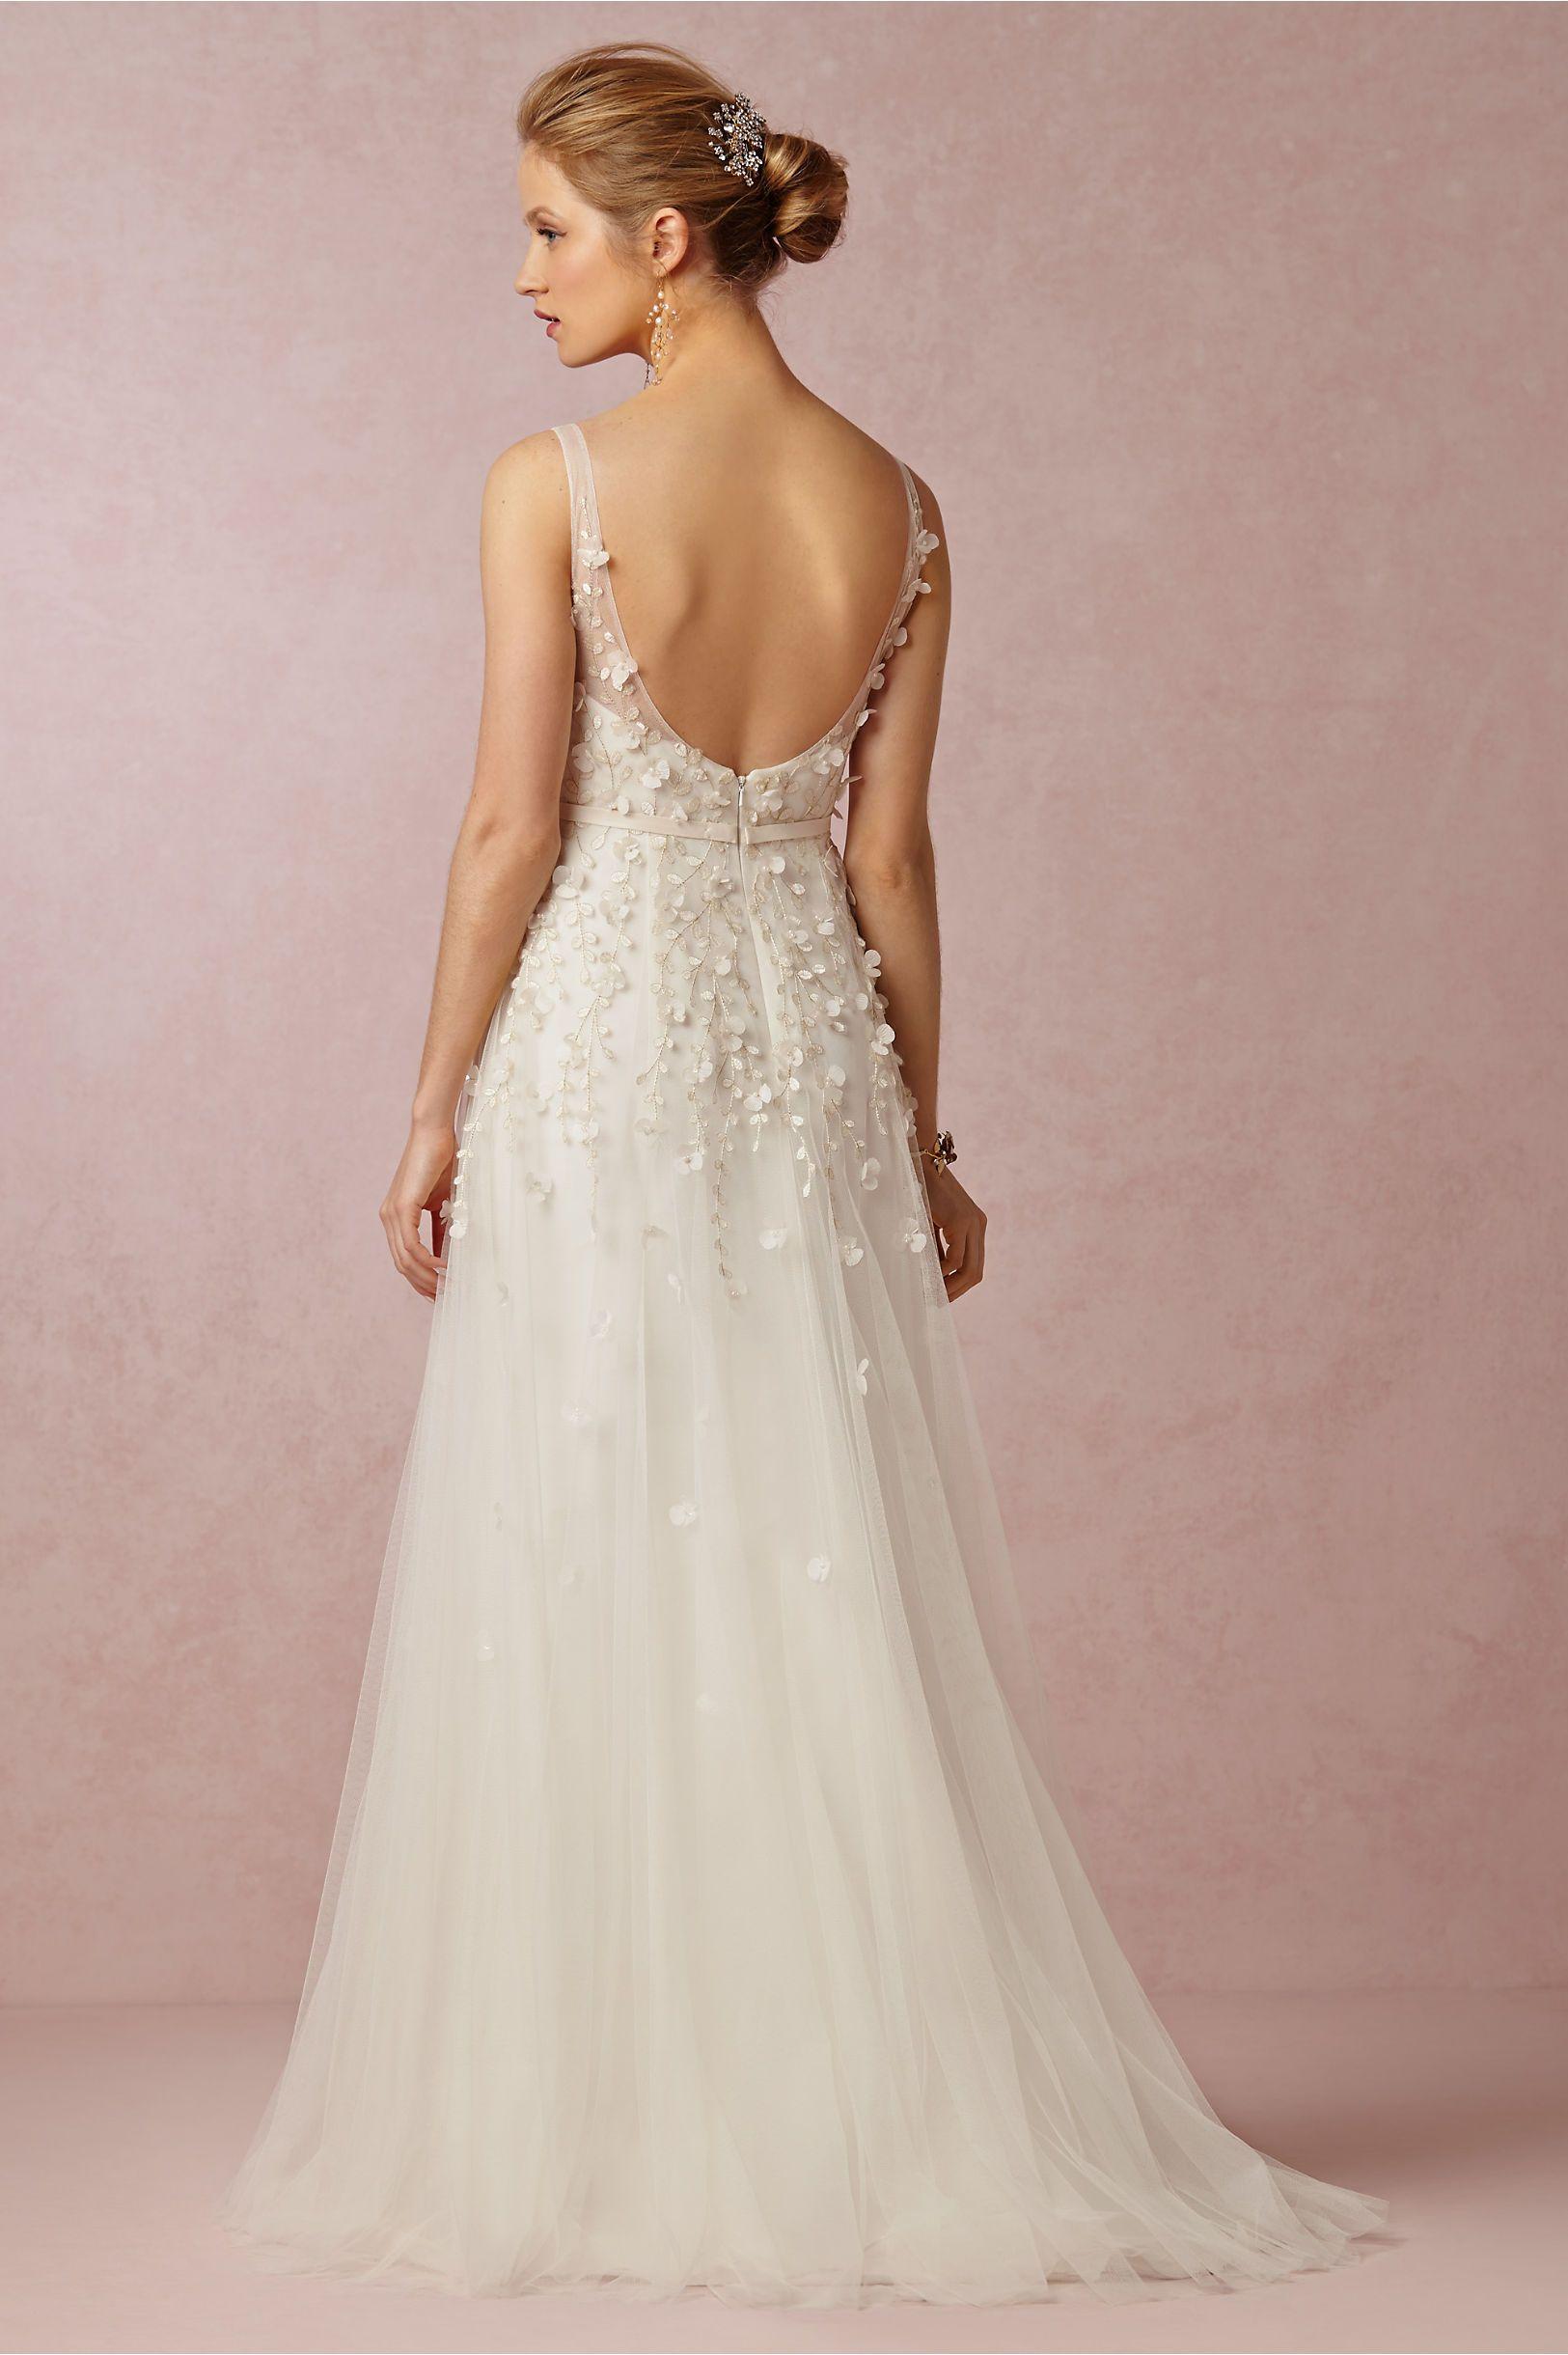 Luisa Gown in Bride Wedding Dresses at BHLDN | Wedding Dresses ...